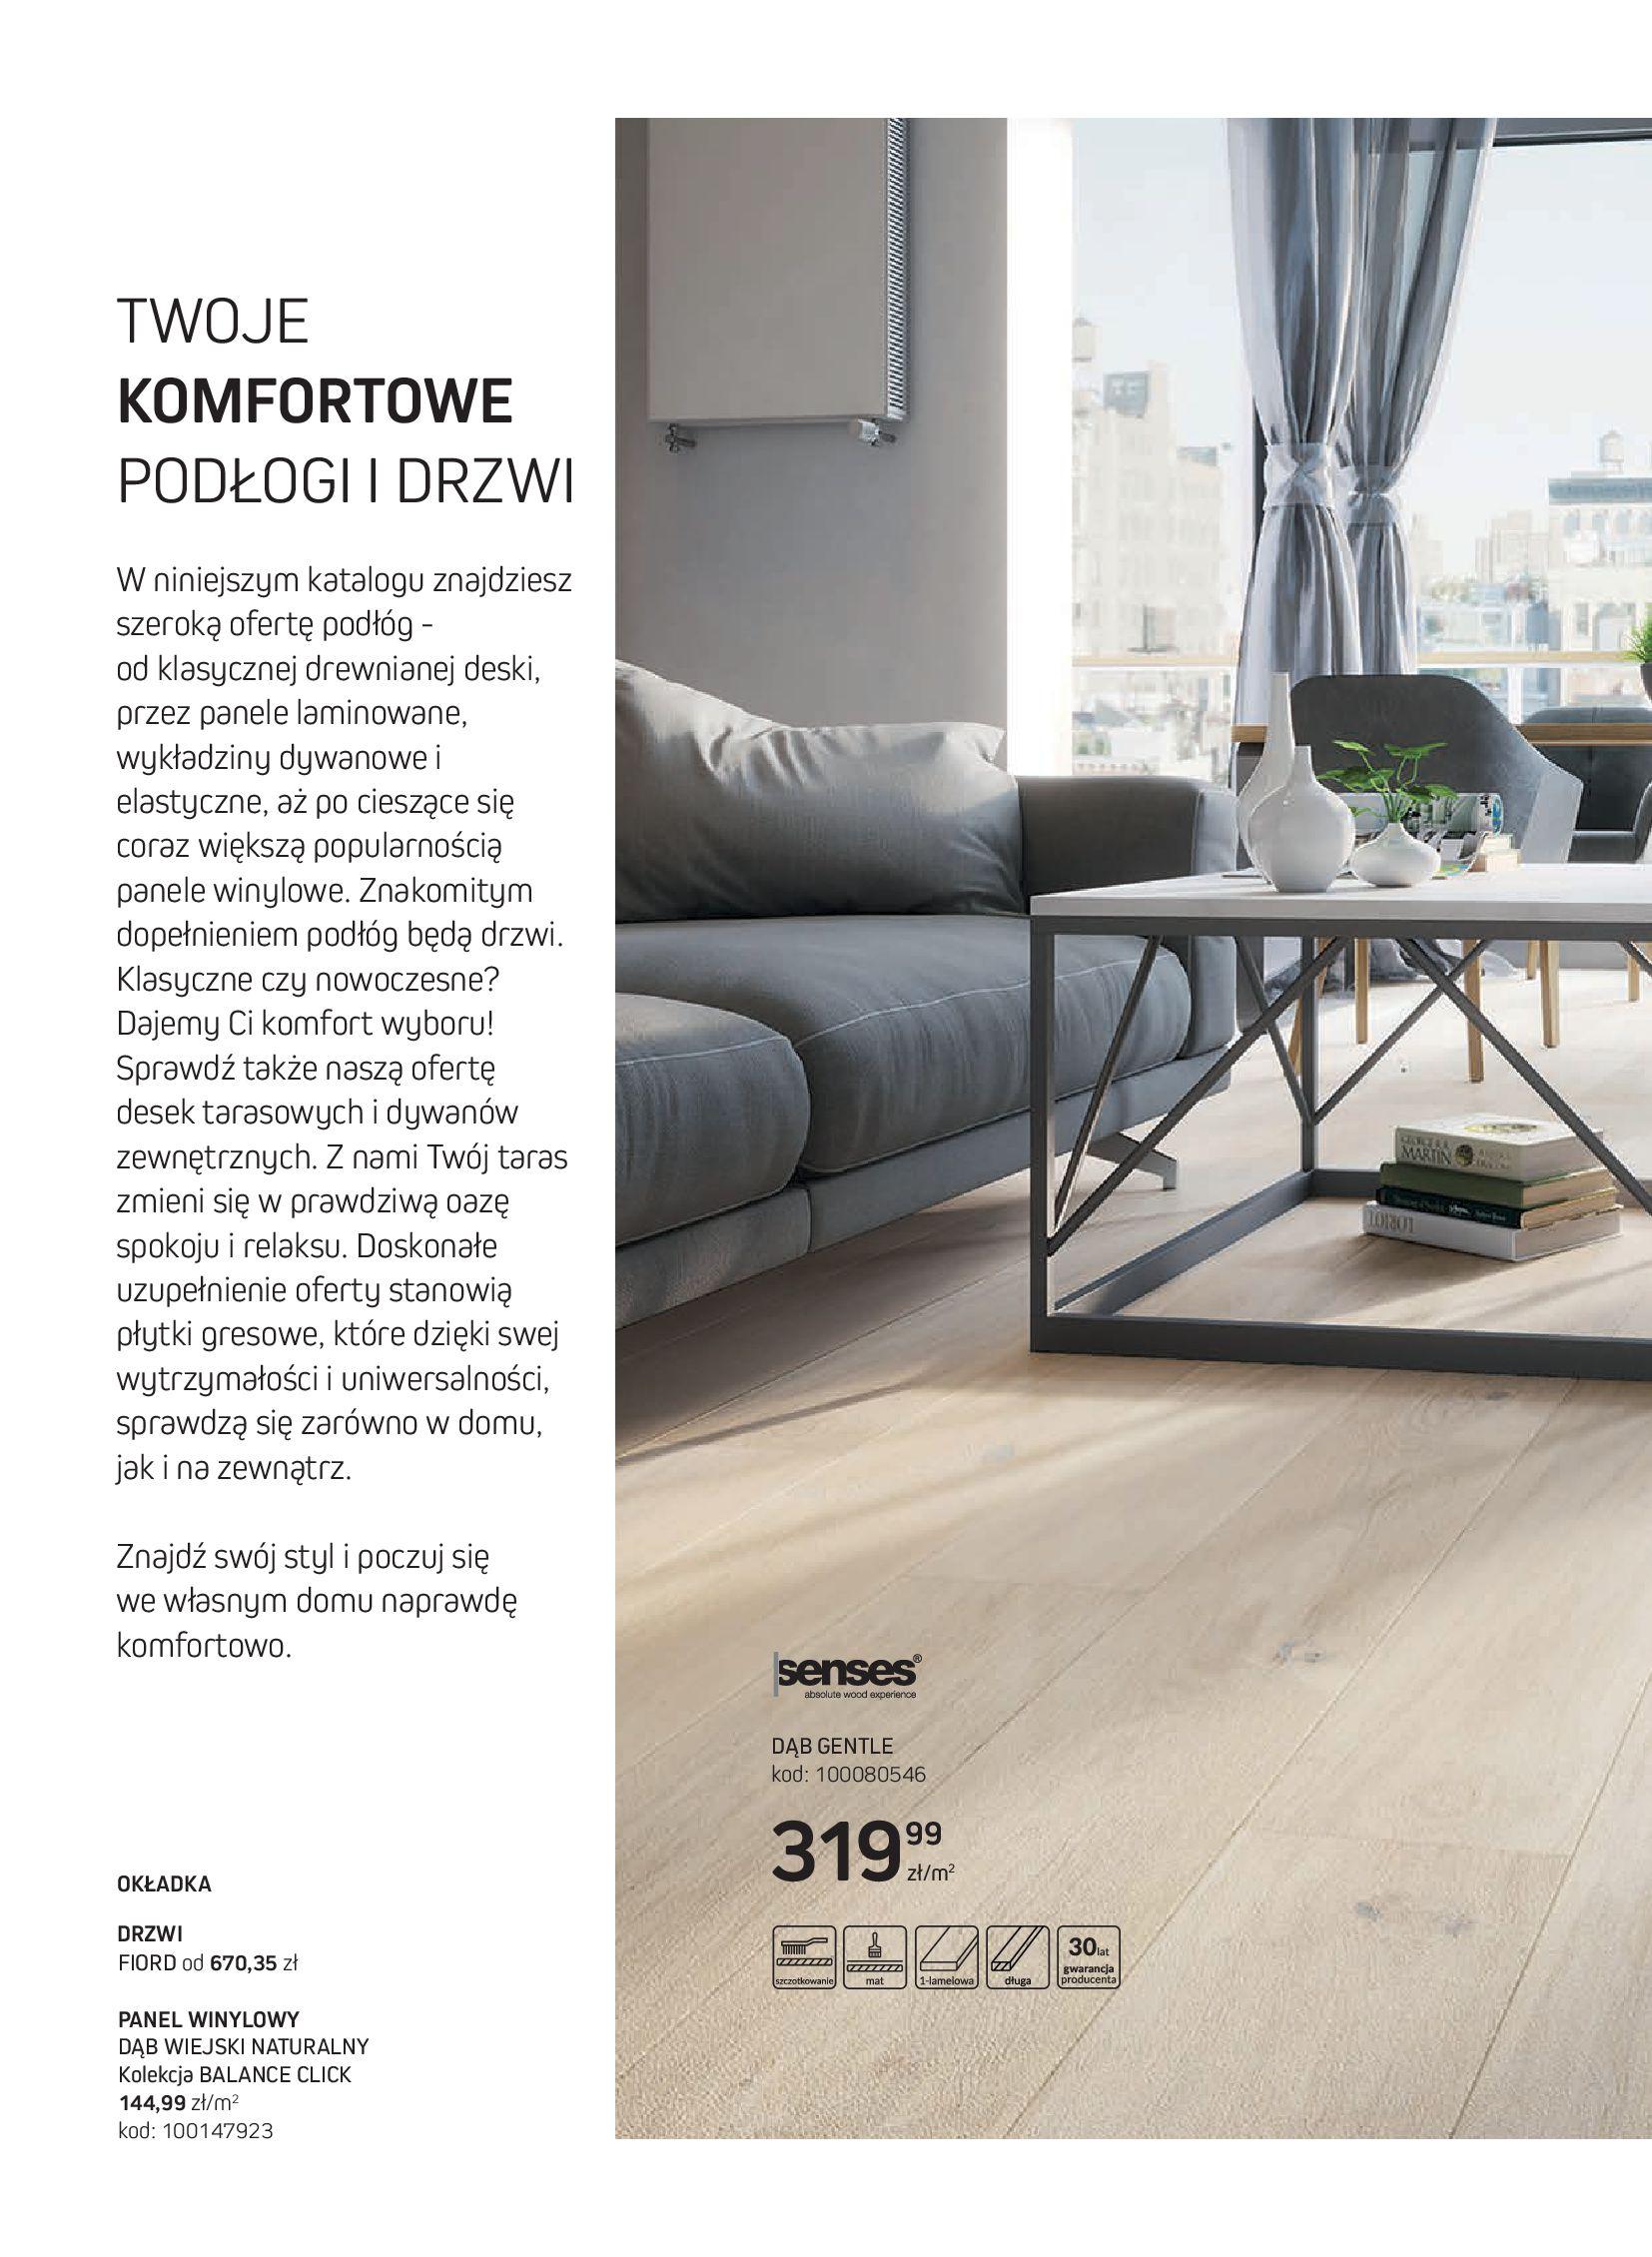 Gazetka Komfort: Gazetka Komfort - Katalog podłogi i drzwi 2021-06-16 page-2